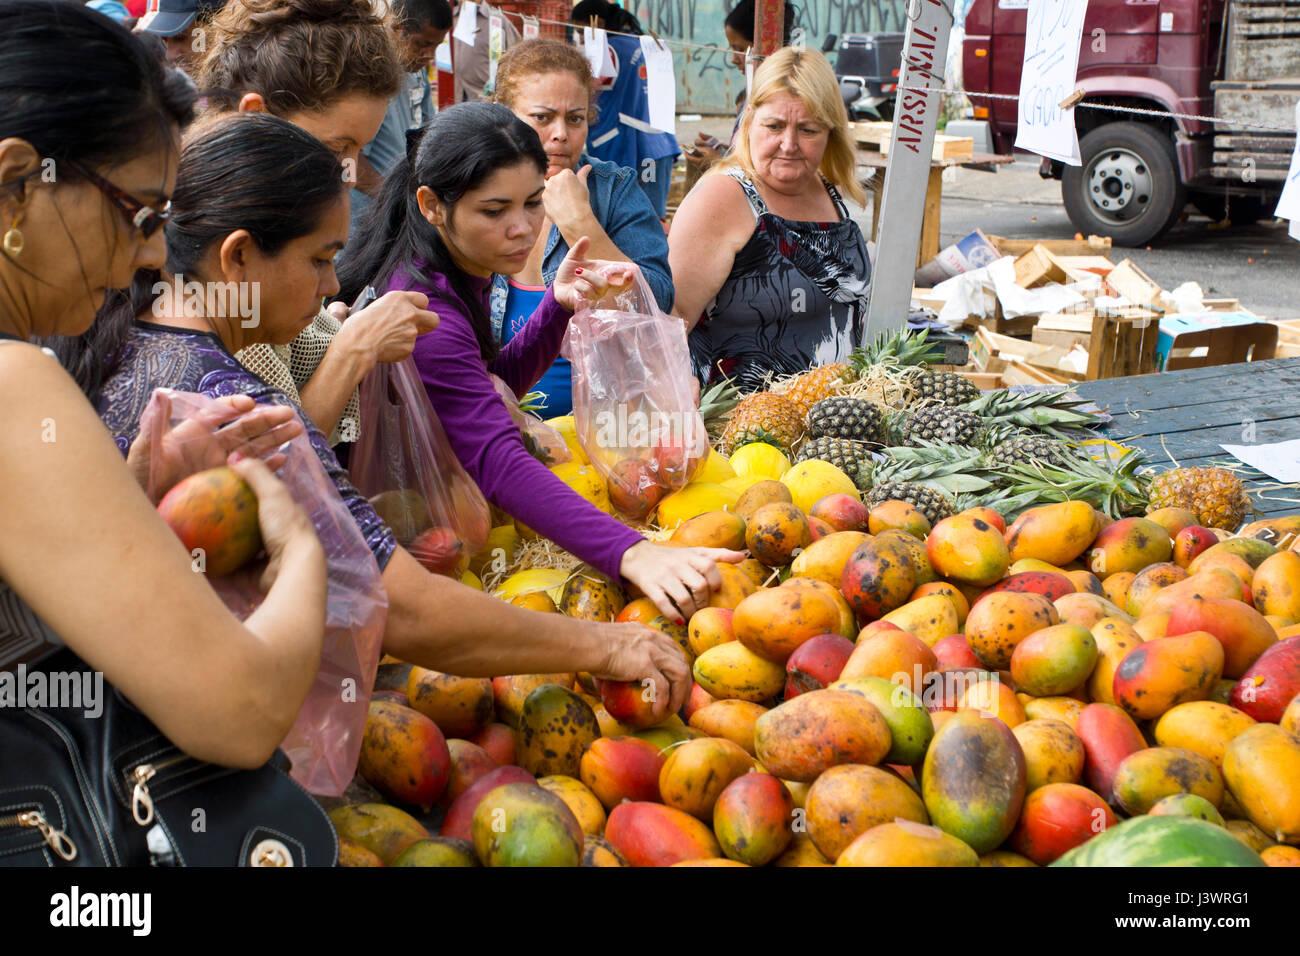 brazilian markets offer a huge  variation of fruits and vegetables - Stock Image